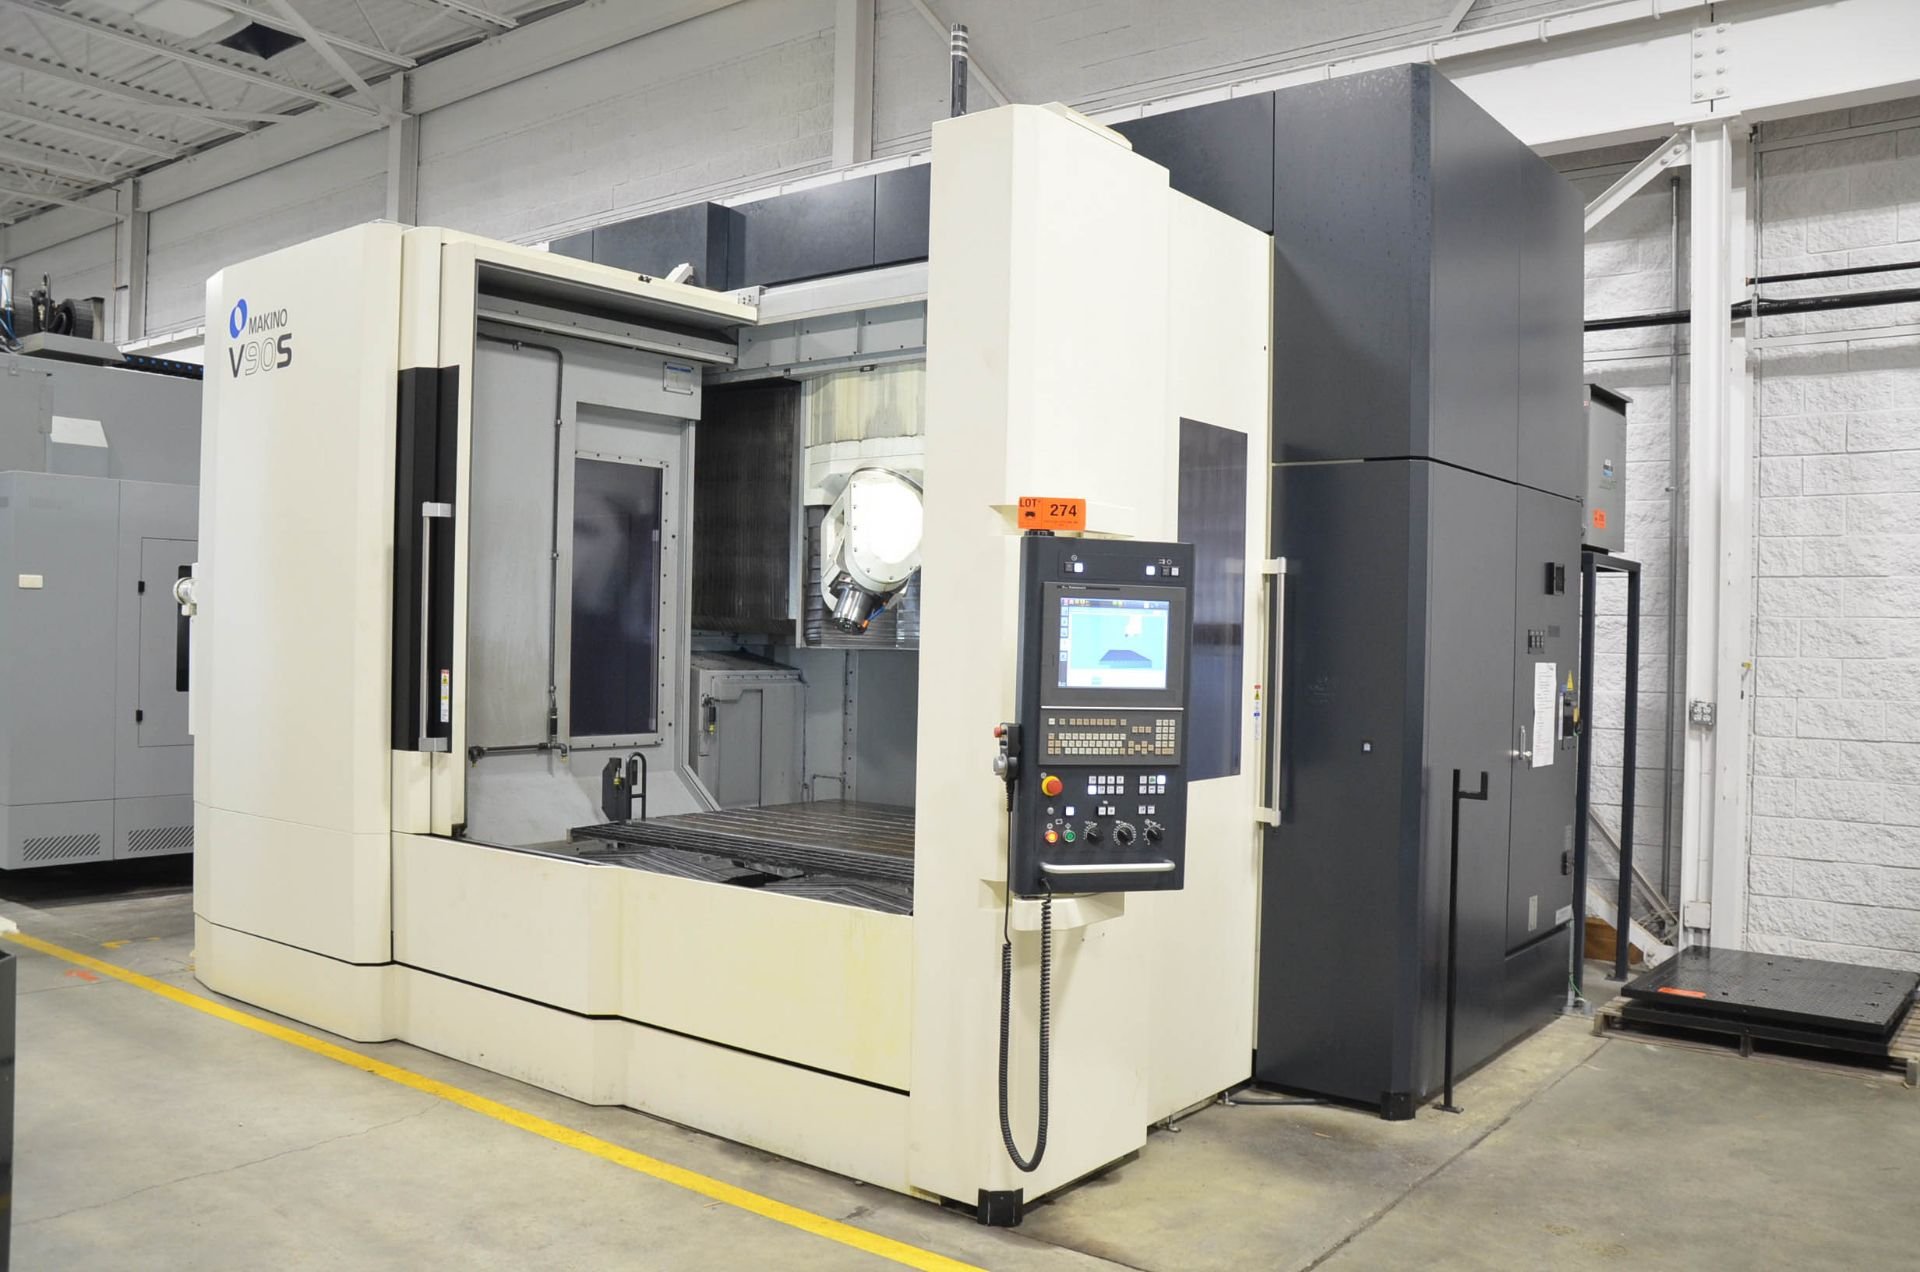 "MAKINO (NOV 2018) V90S 5-AXIS CNC MACHINING CENTER WITH MAKINO PROFESSIONAL 6 CNC CONTROL, 78.74"" - Image 2 of 15"